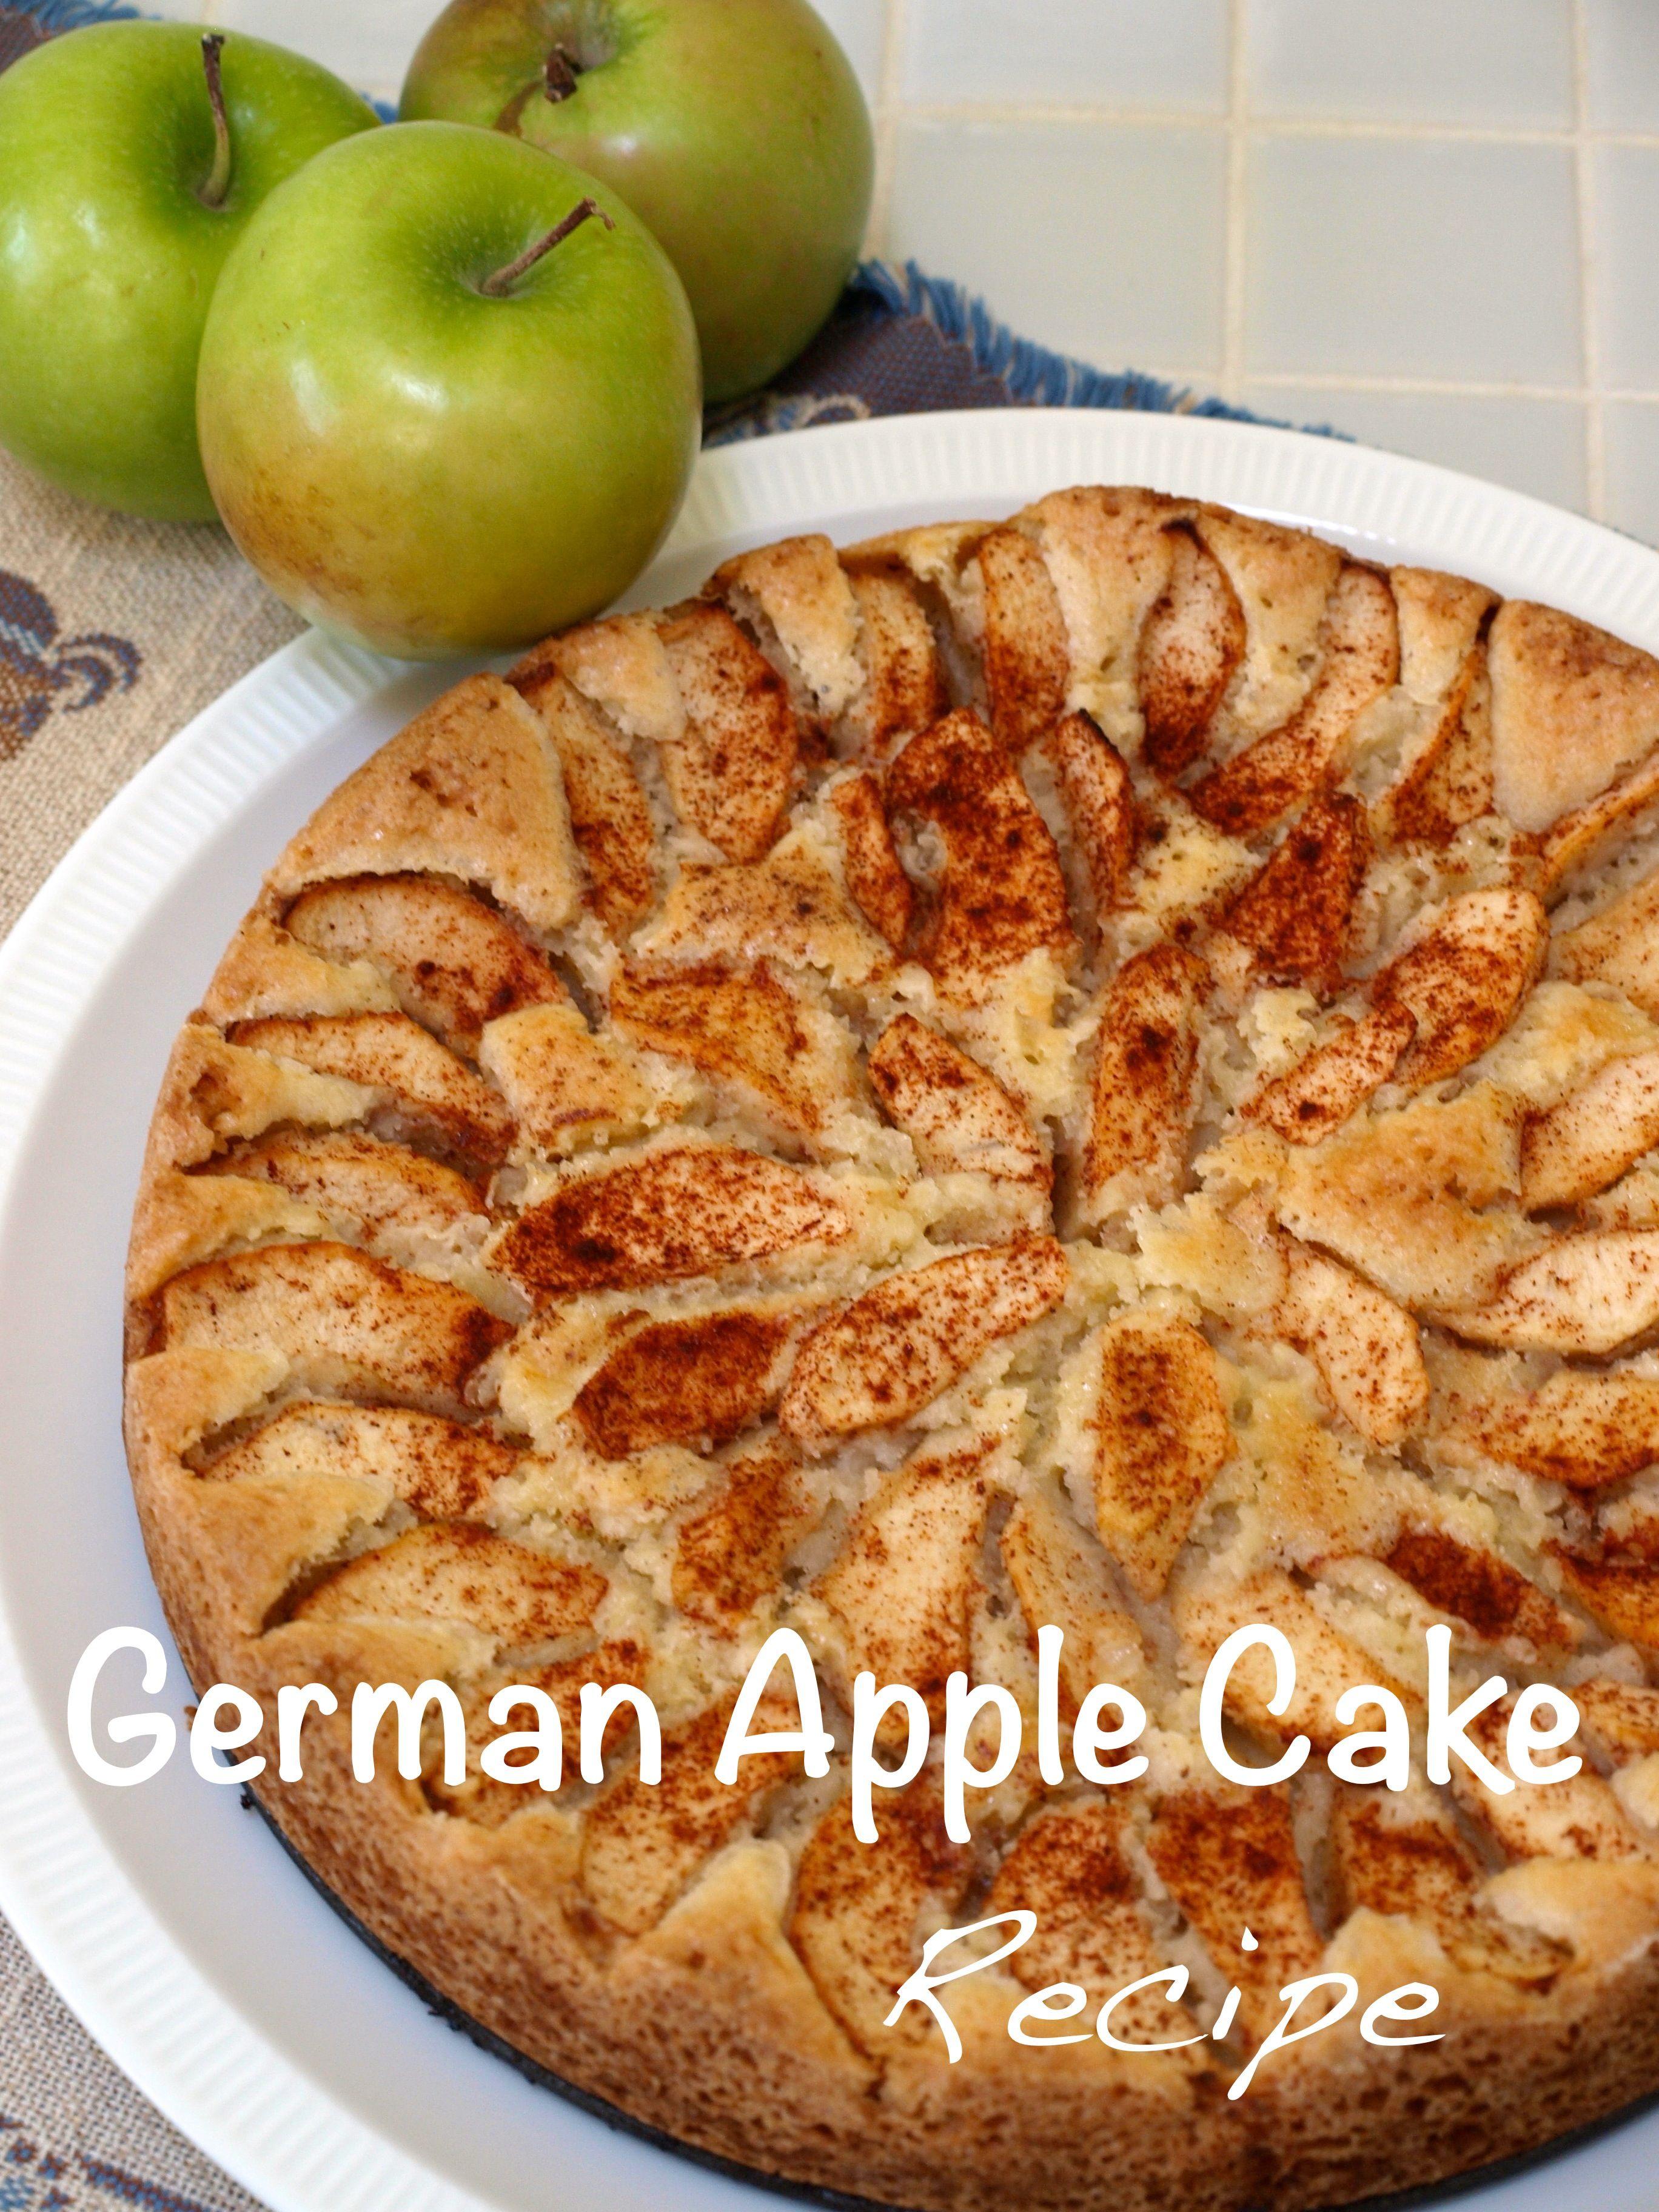 German Apple Cake Recipe German Apple Cake Recipes Apple Cake Recipes